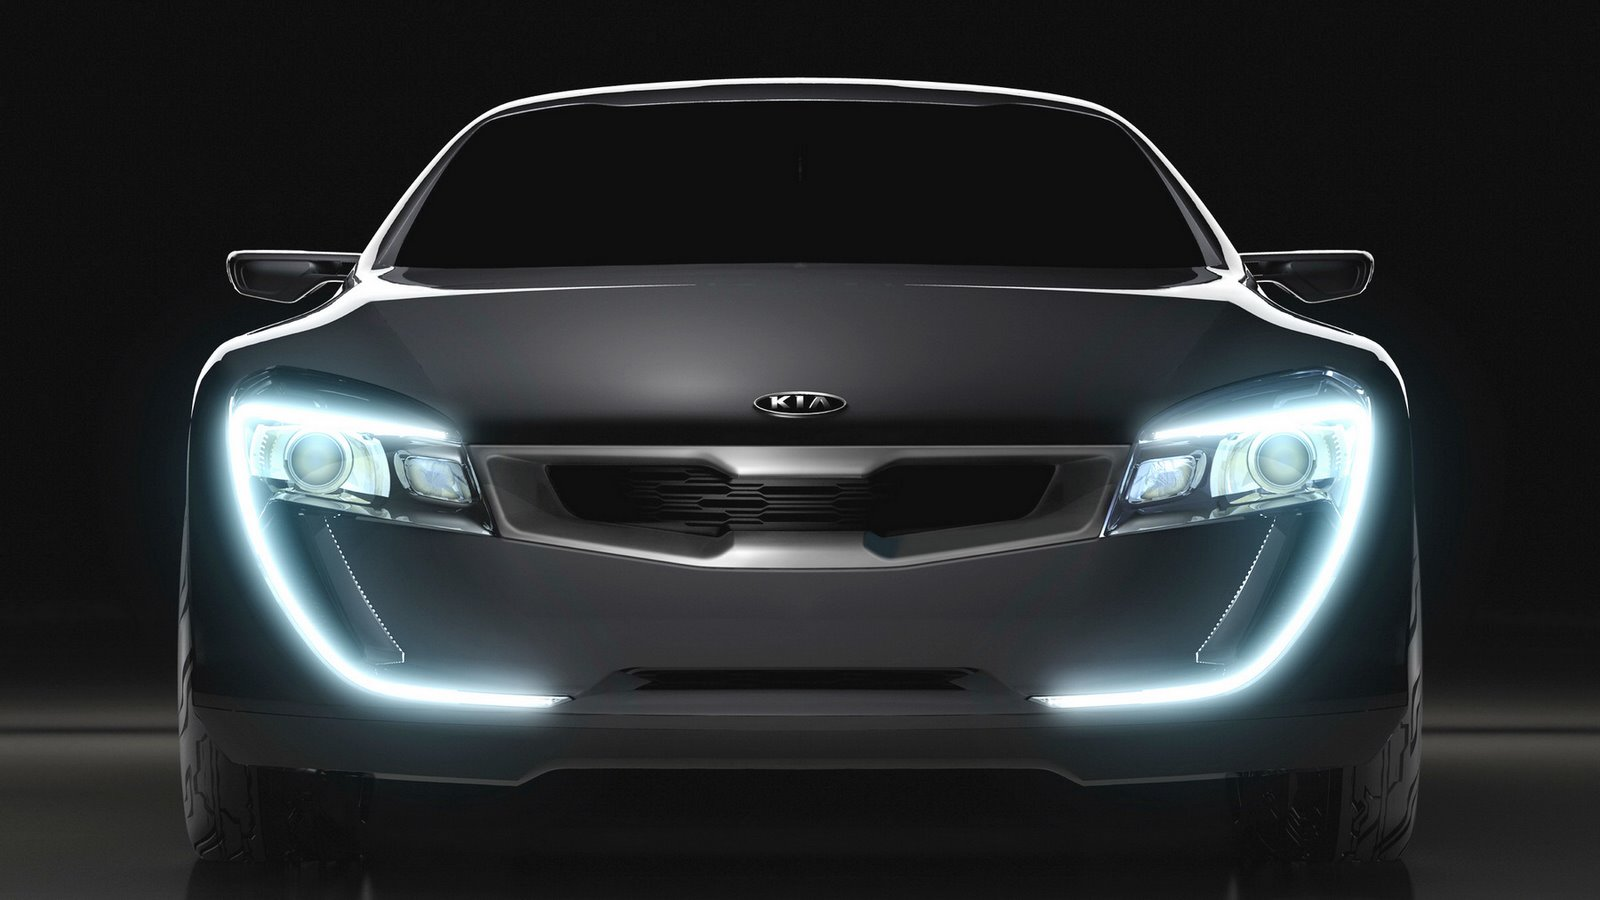 Imagenes De Coches Hd: Future Car Designs